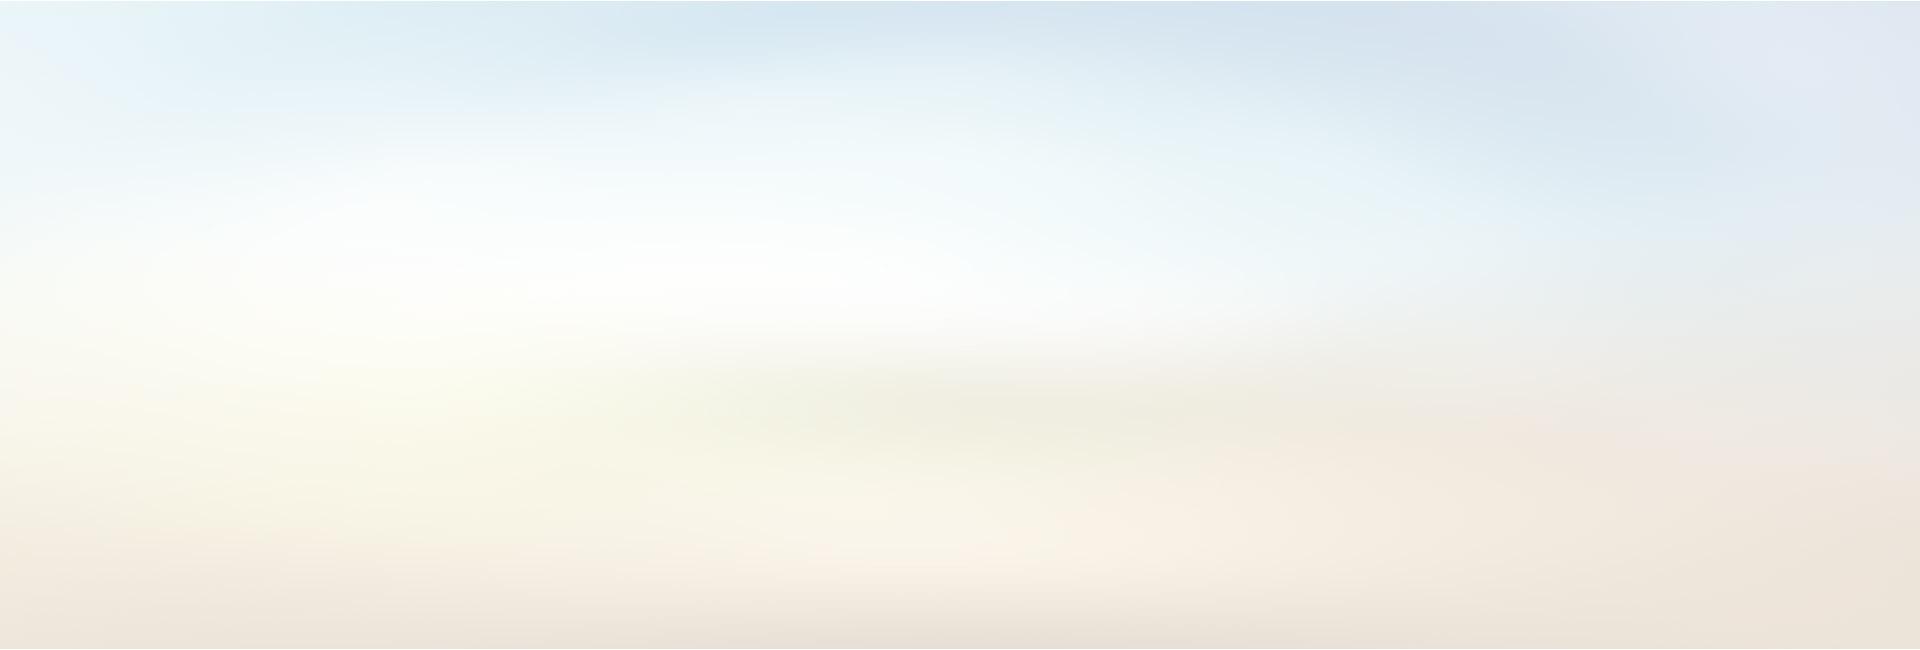 bannergraphic-background-1